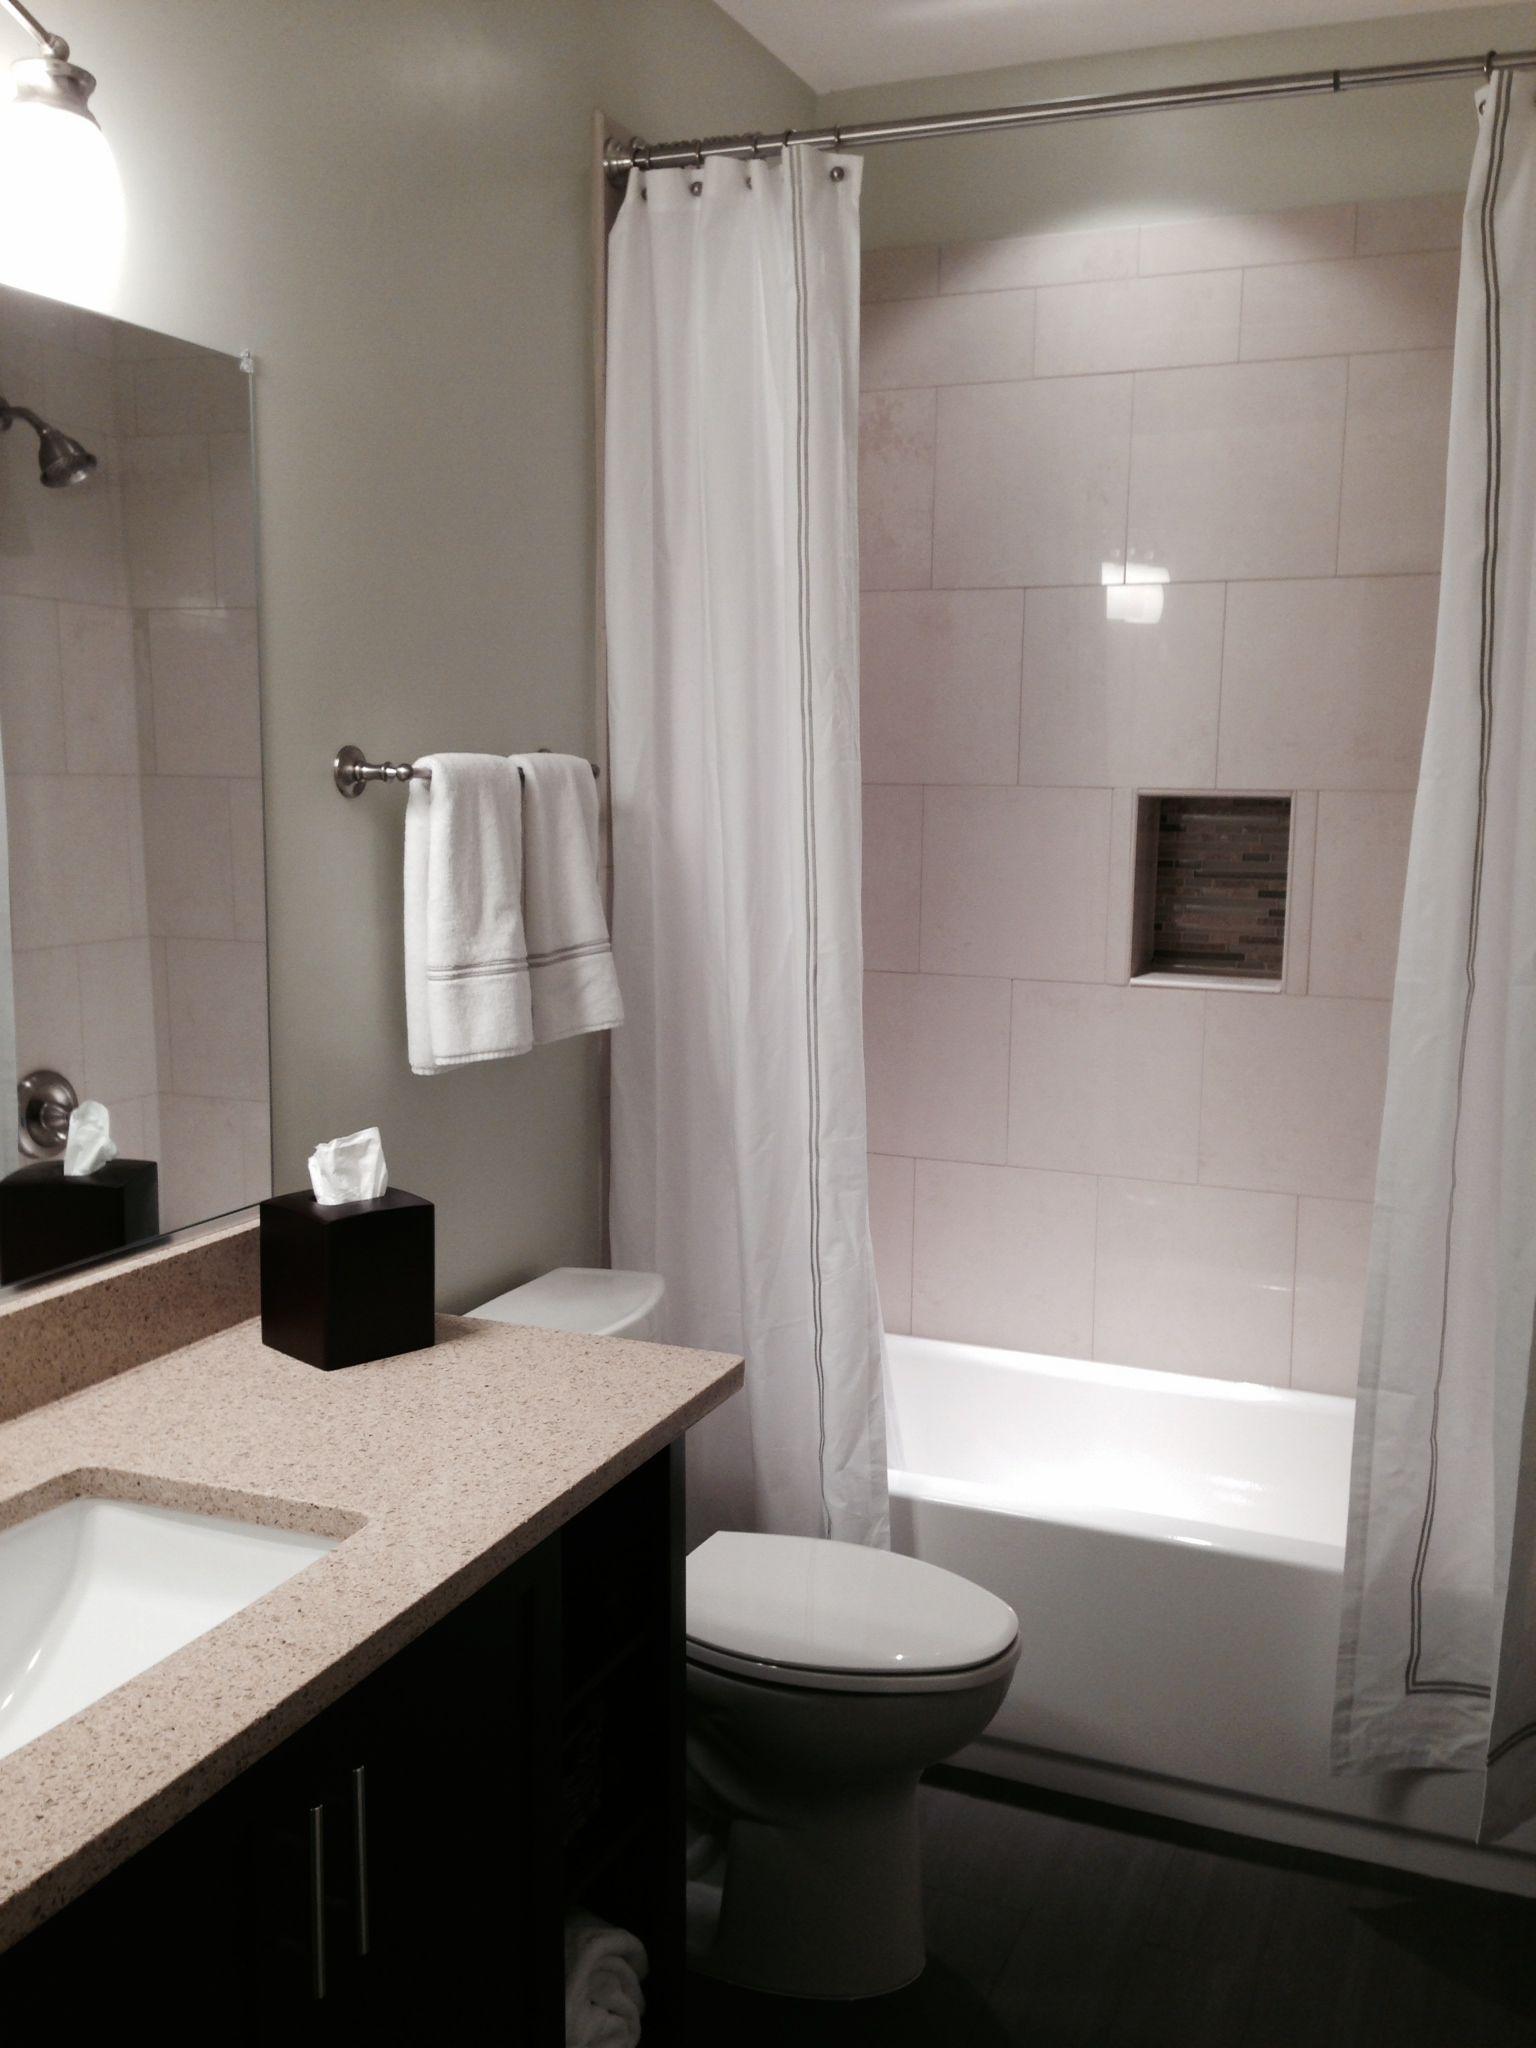 Photos of bathroom in finished basement in Fairfax VA on Restroom Renovation  id=24738